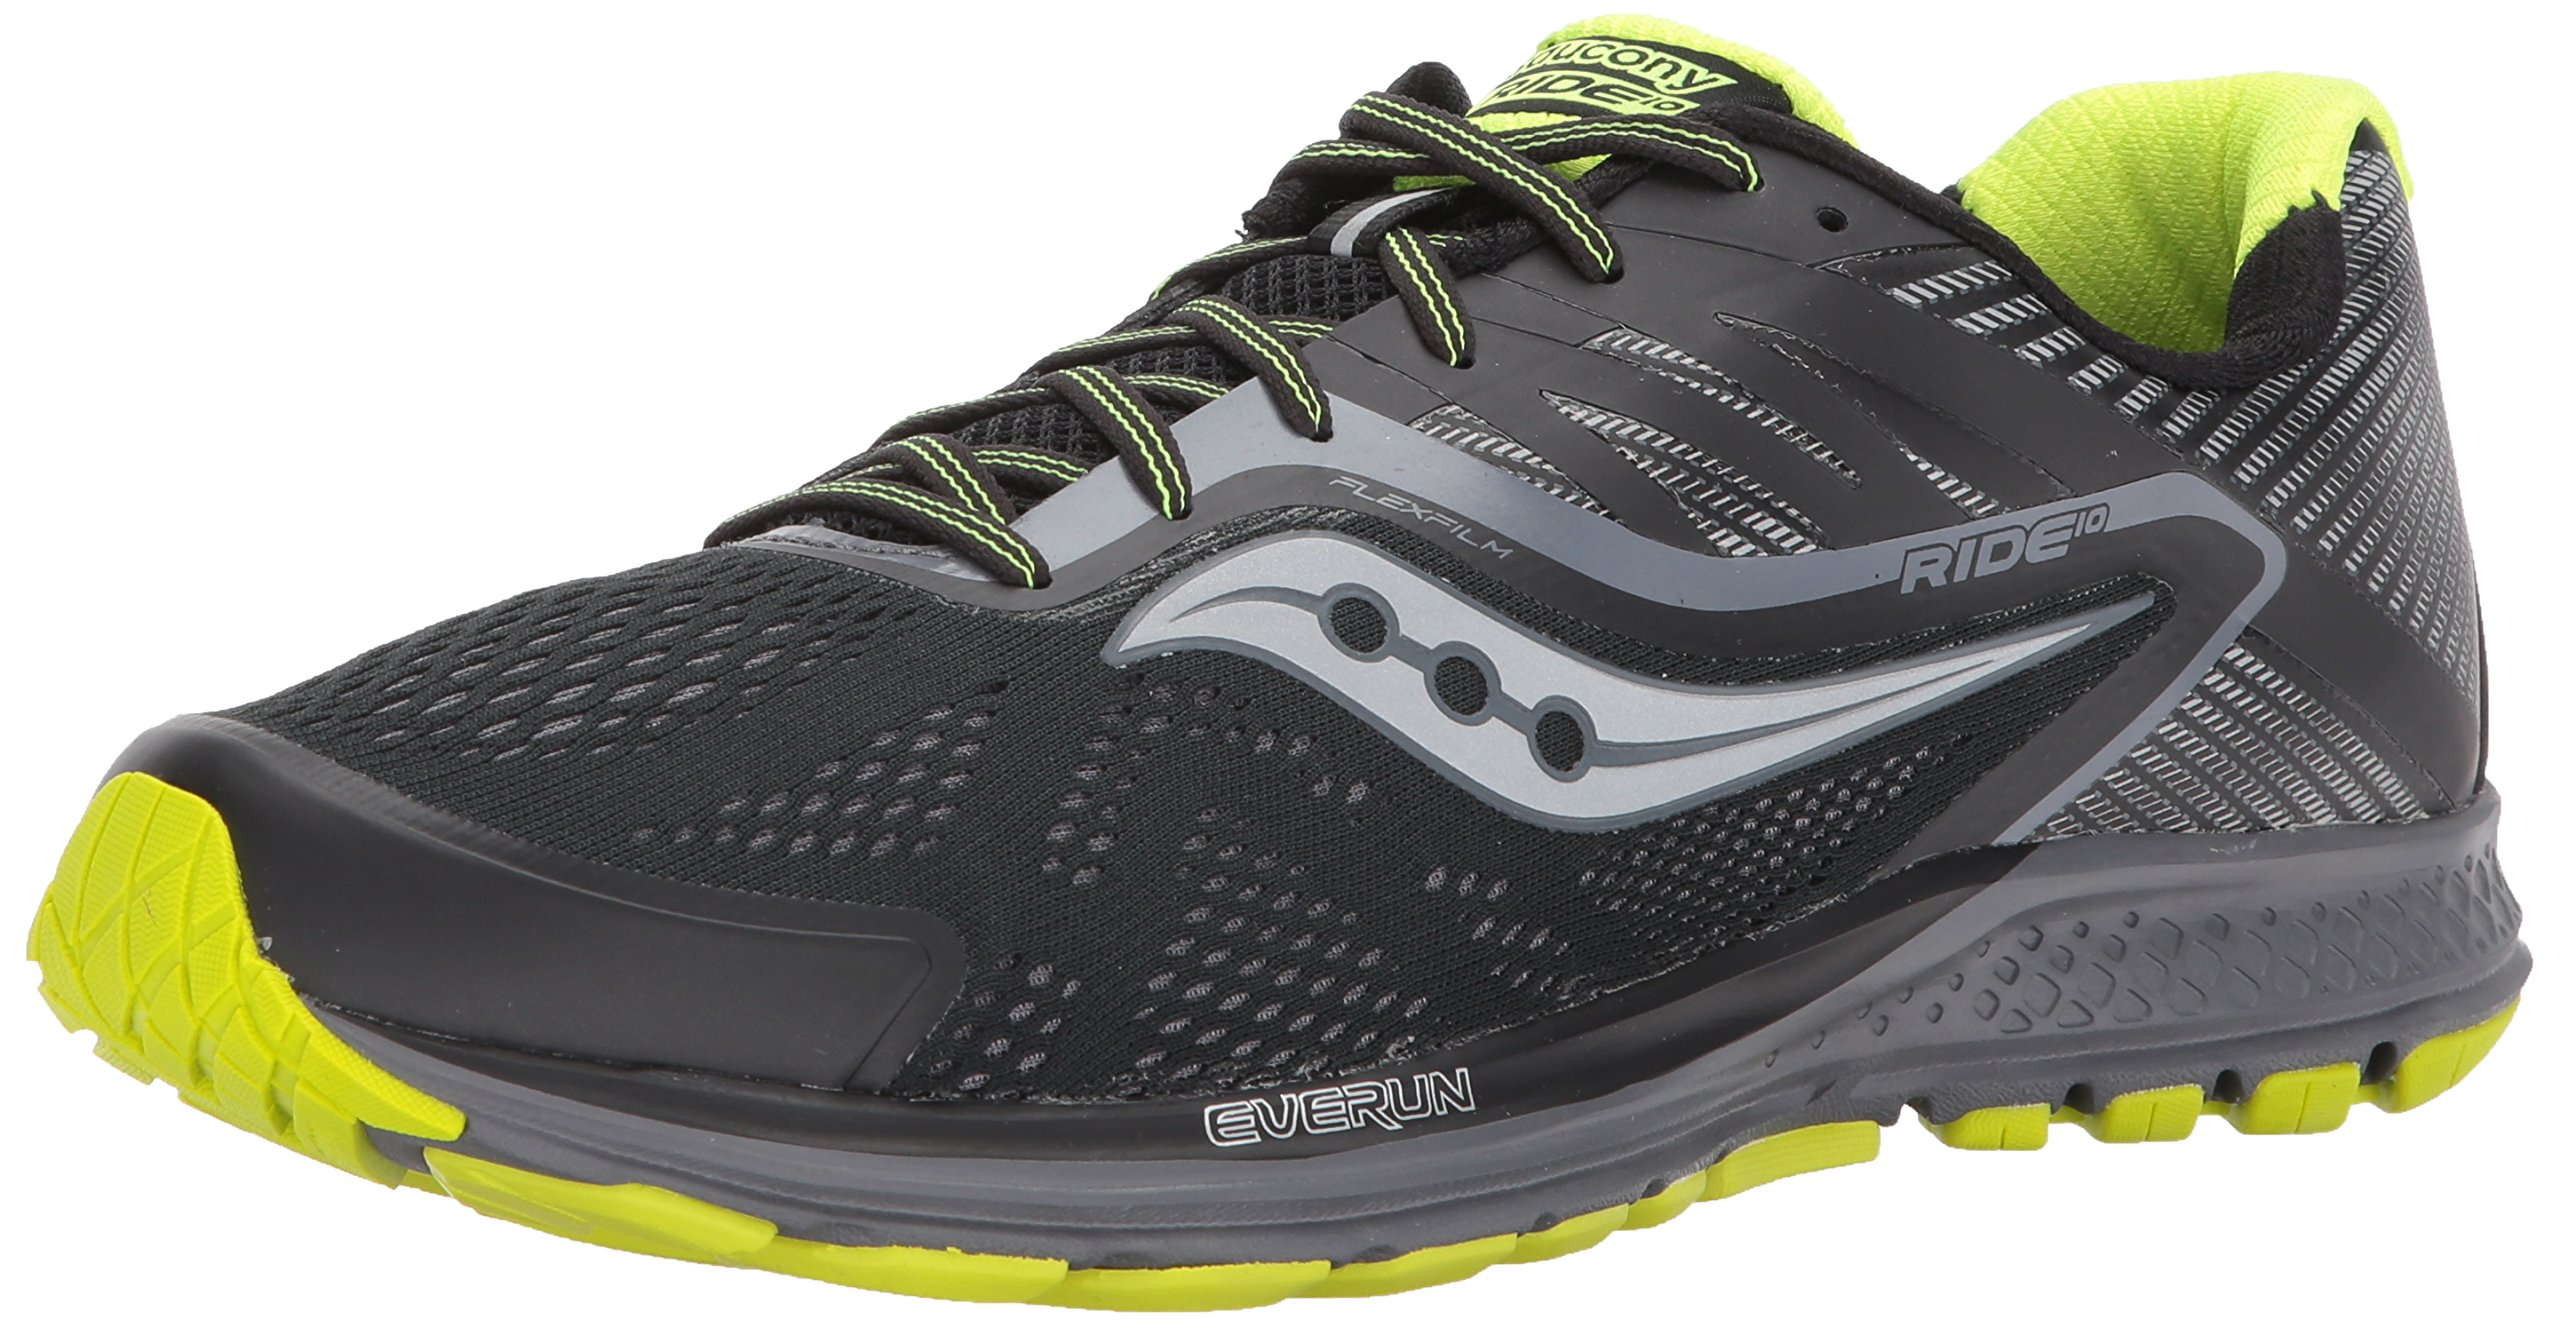 Saucony Men's Ride 10 Running Shoe, Black Citron, 12.5 M US